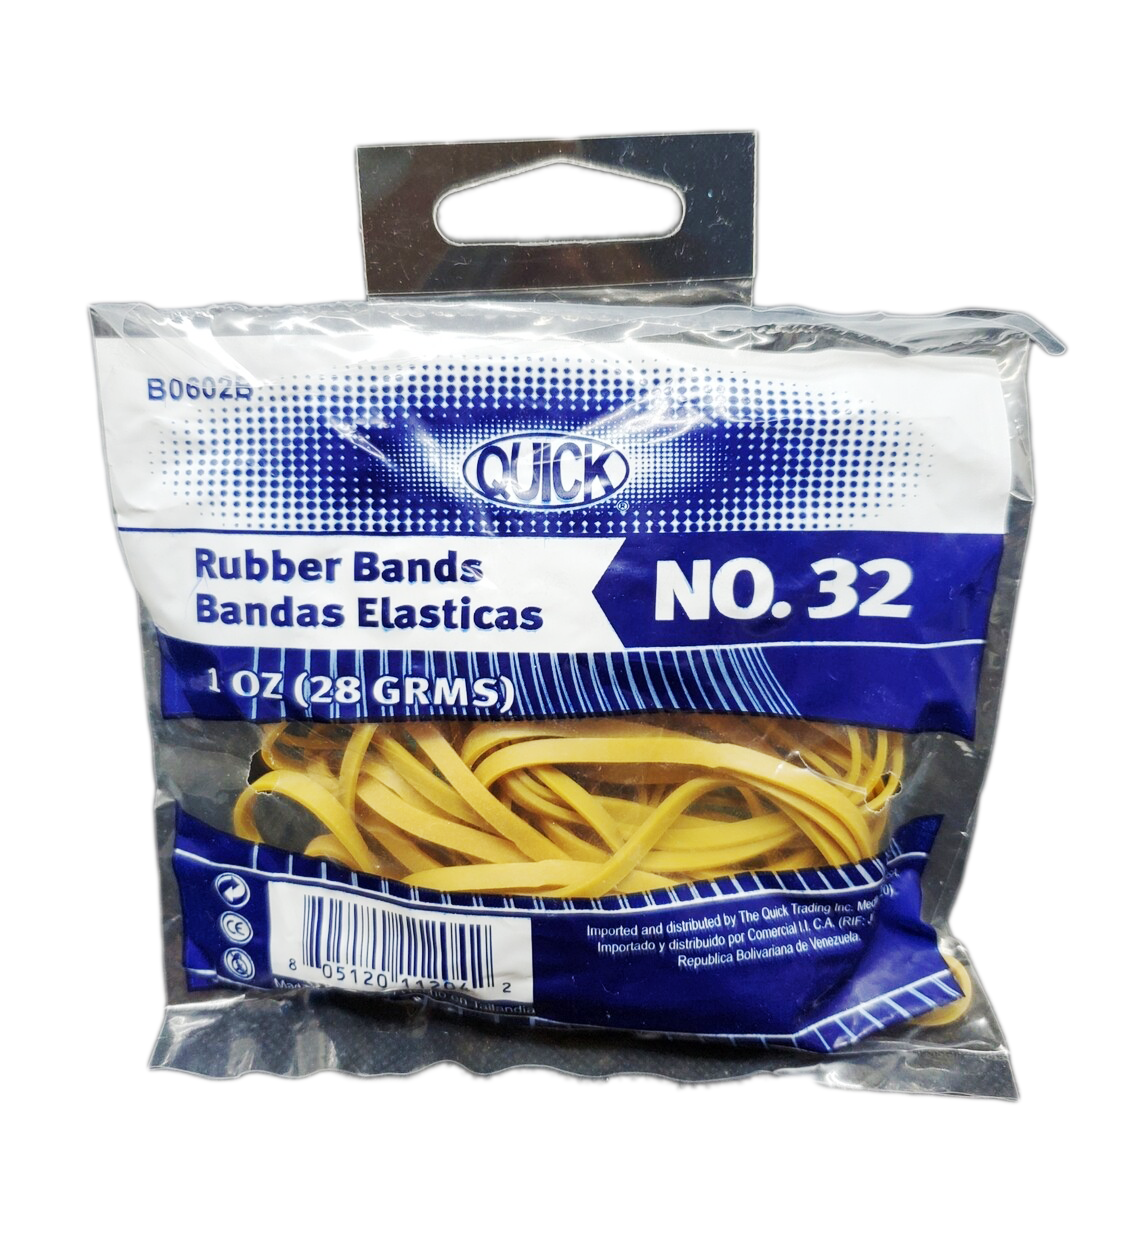 Rubber Bands No. 32